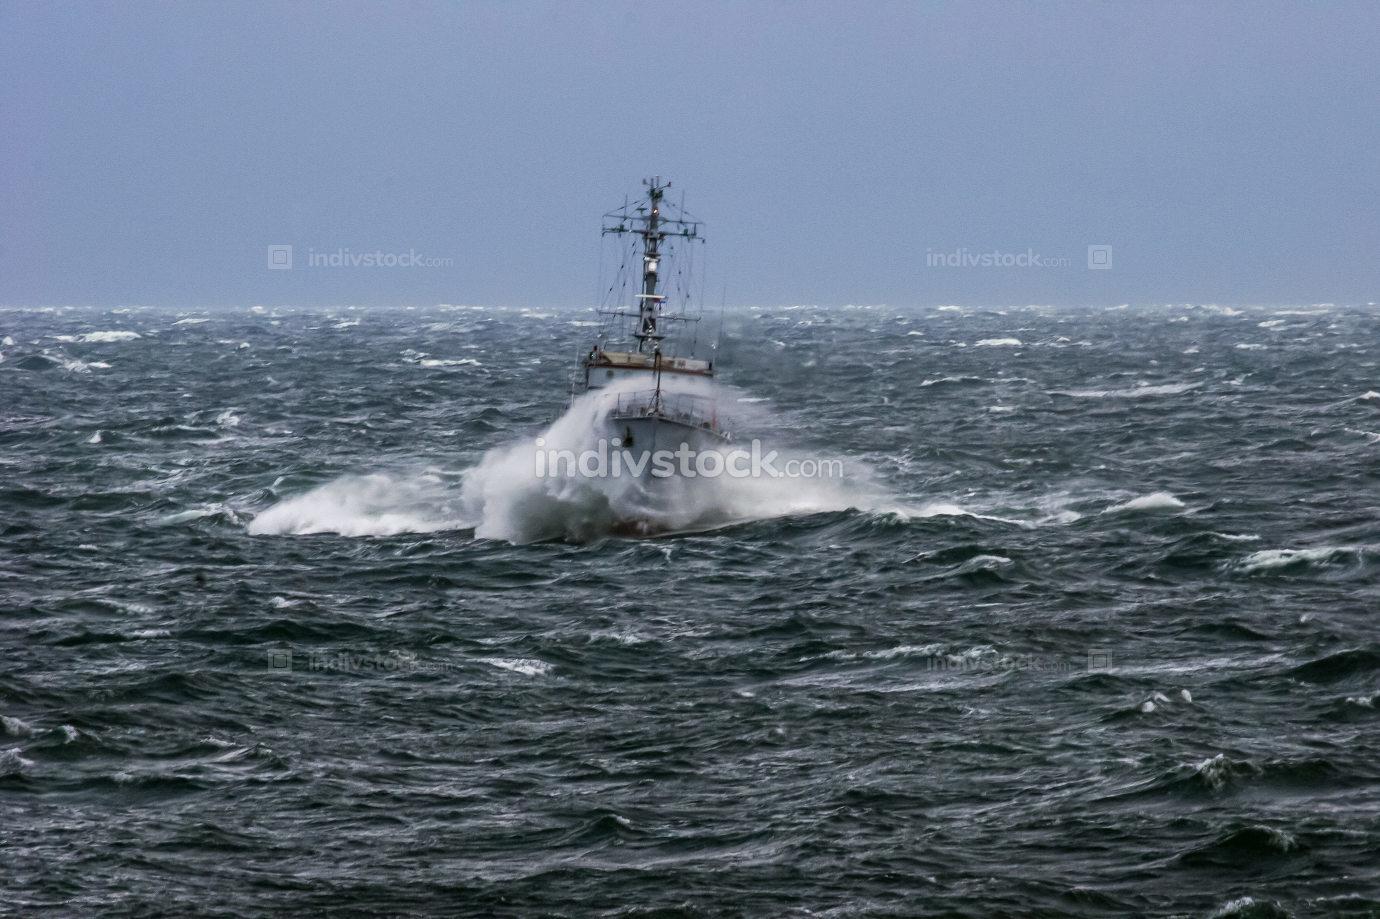 NATO military ship at sea during a storm.